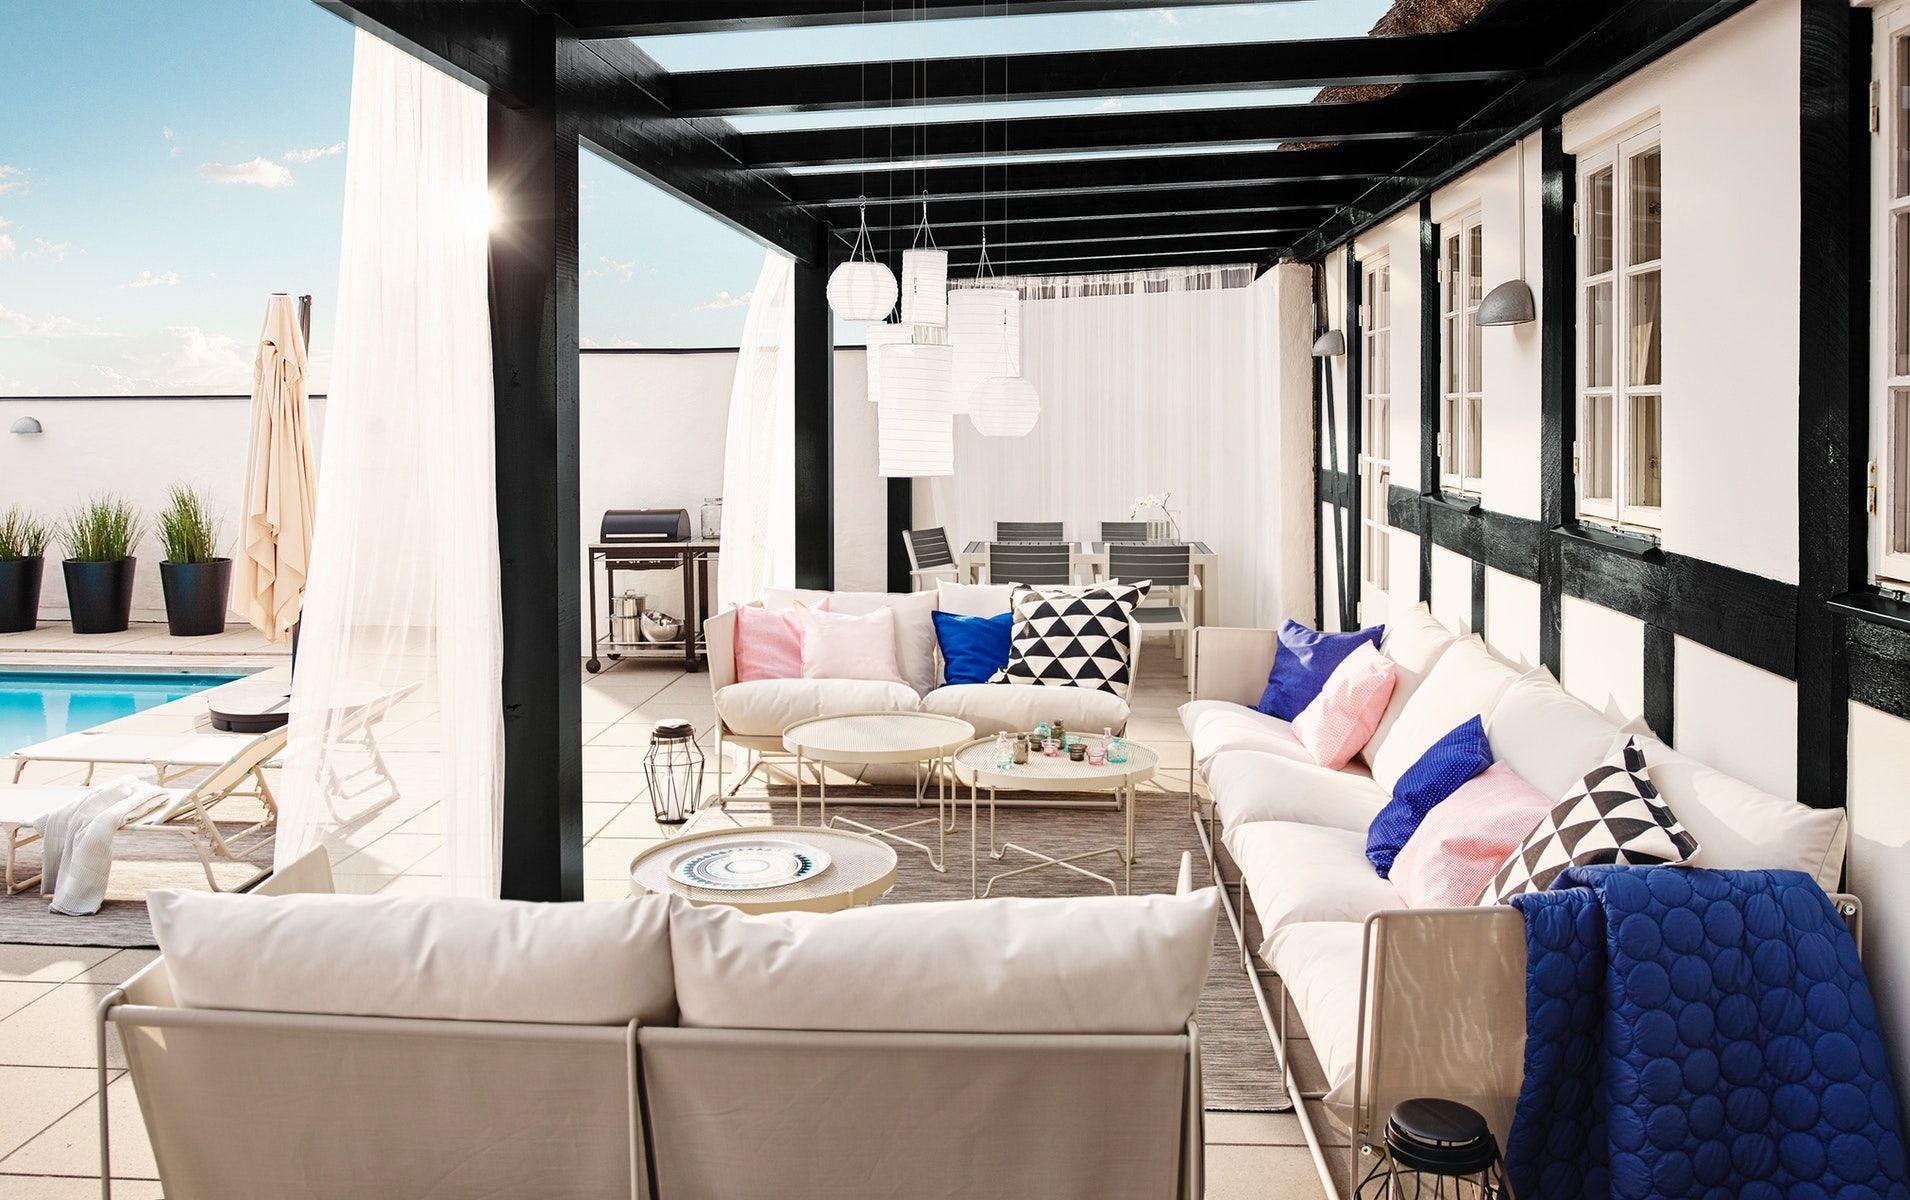 Havsten 2 Seat Sofa In Outdoor Beige Ikea Switzerland Sit Back And Relax Living Room Table Outdoor Couch